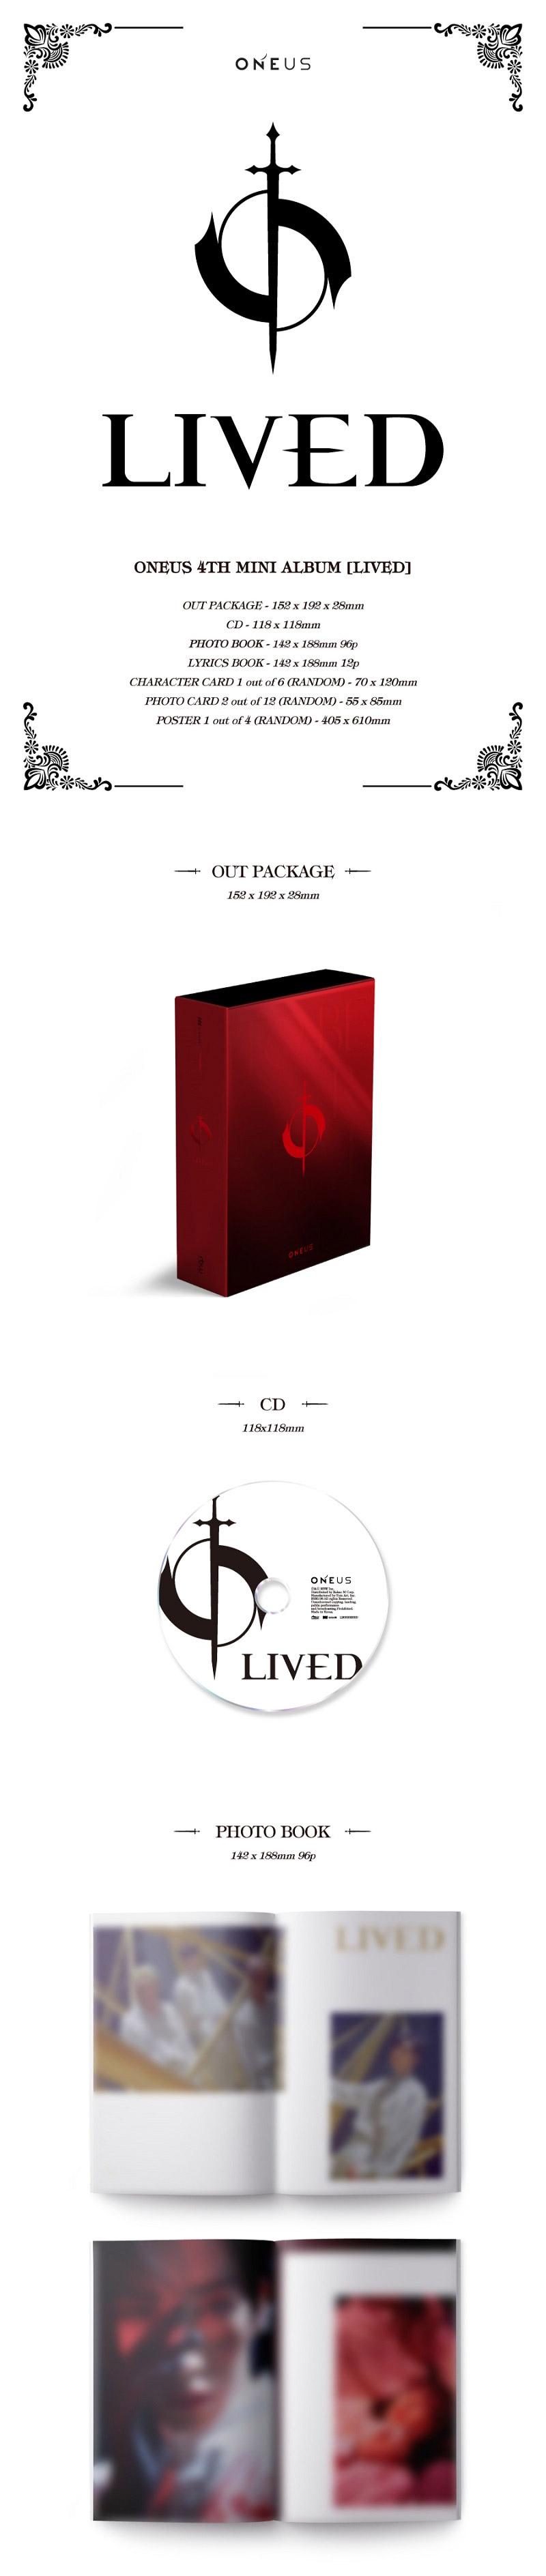 Oneus Lived Album OT6 Display